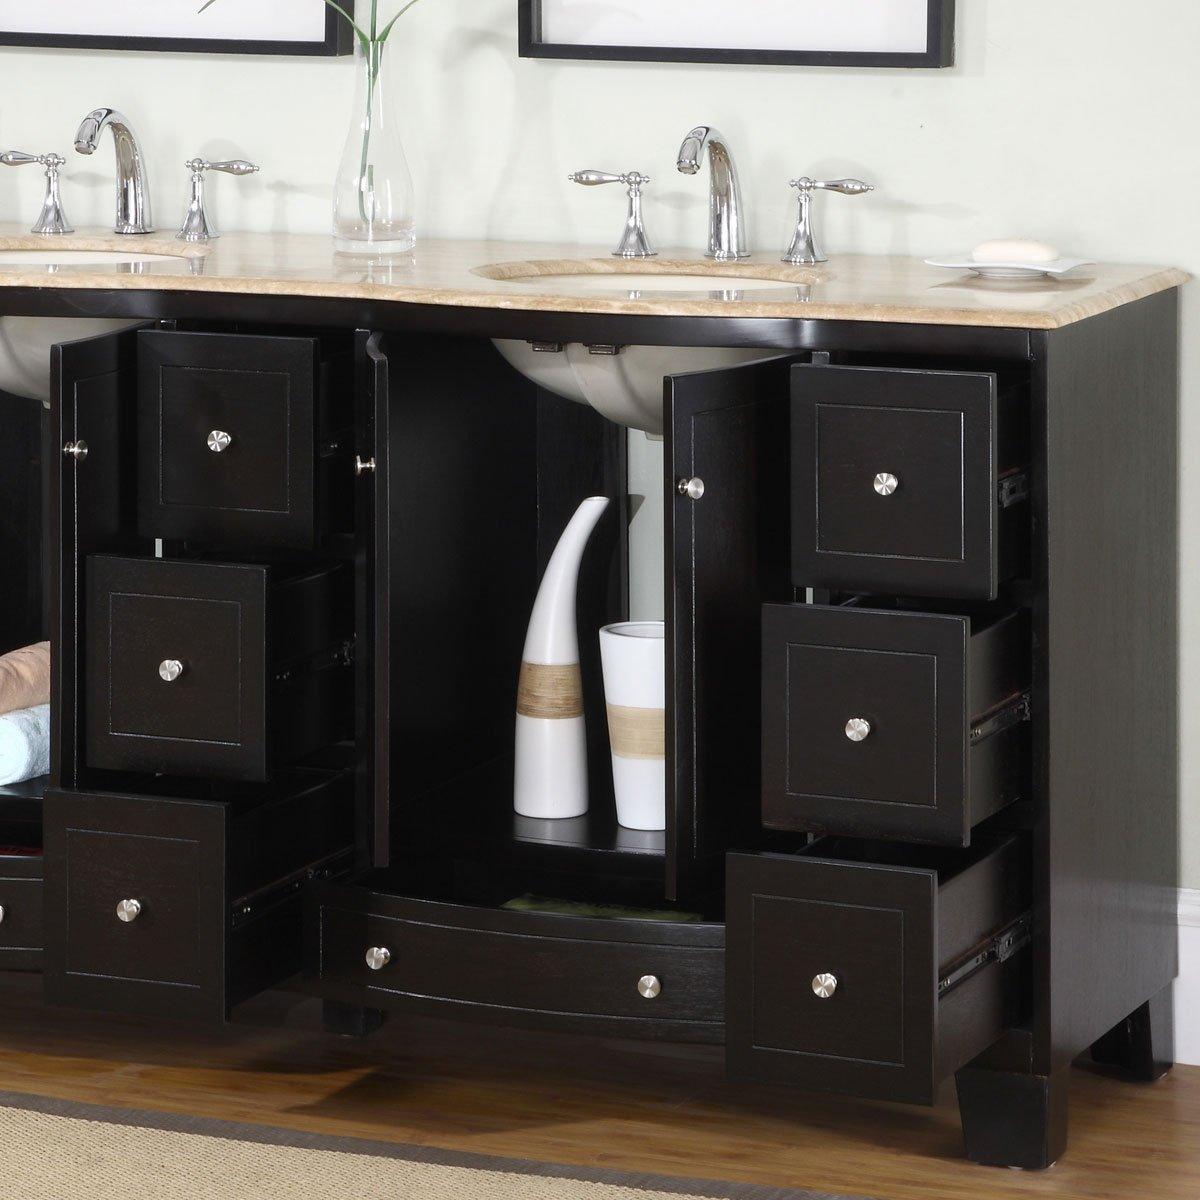 72 perfecta pa 5125 bathroom vanity double sink cabinet espresso - Amazon Com Silkroad Exclusive Countertop Travertine Stone Double Sink Bathroom Vanity With Dual Cabinet 72 Inch Home Kitchen